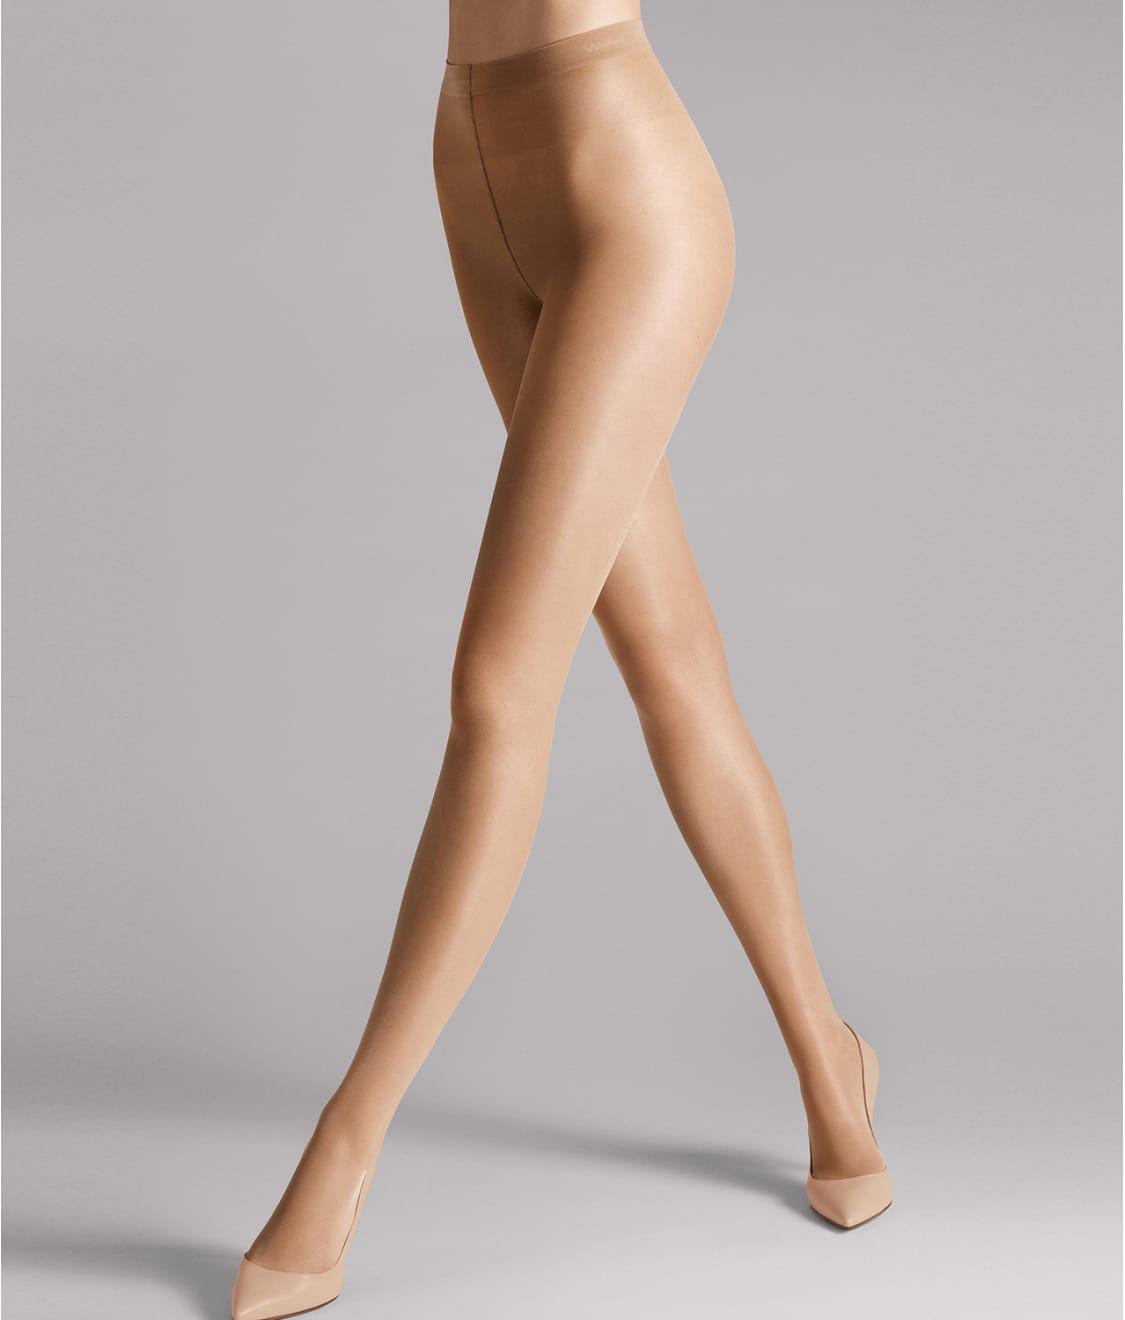 Panties briefs spank